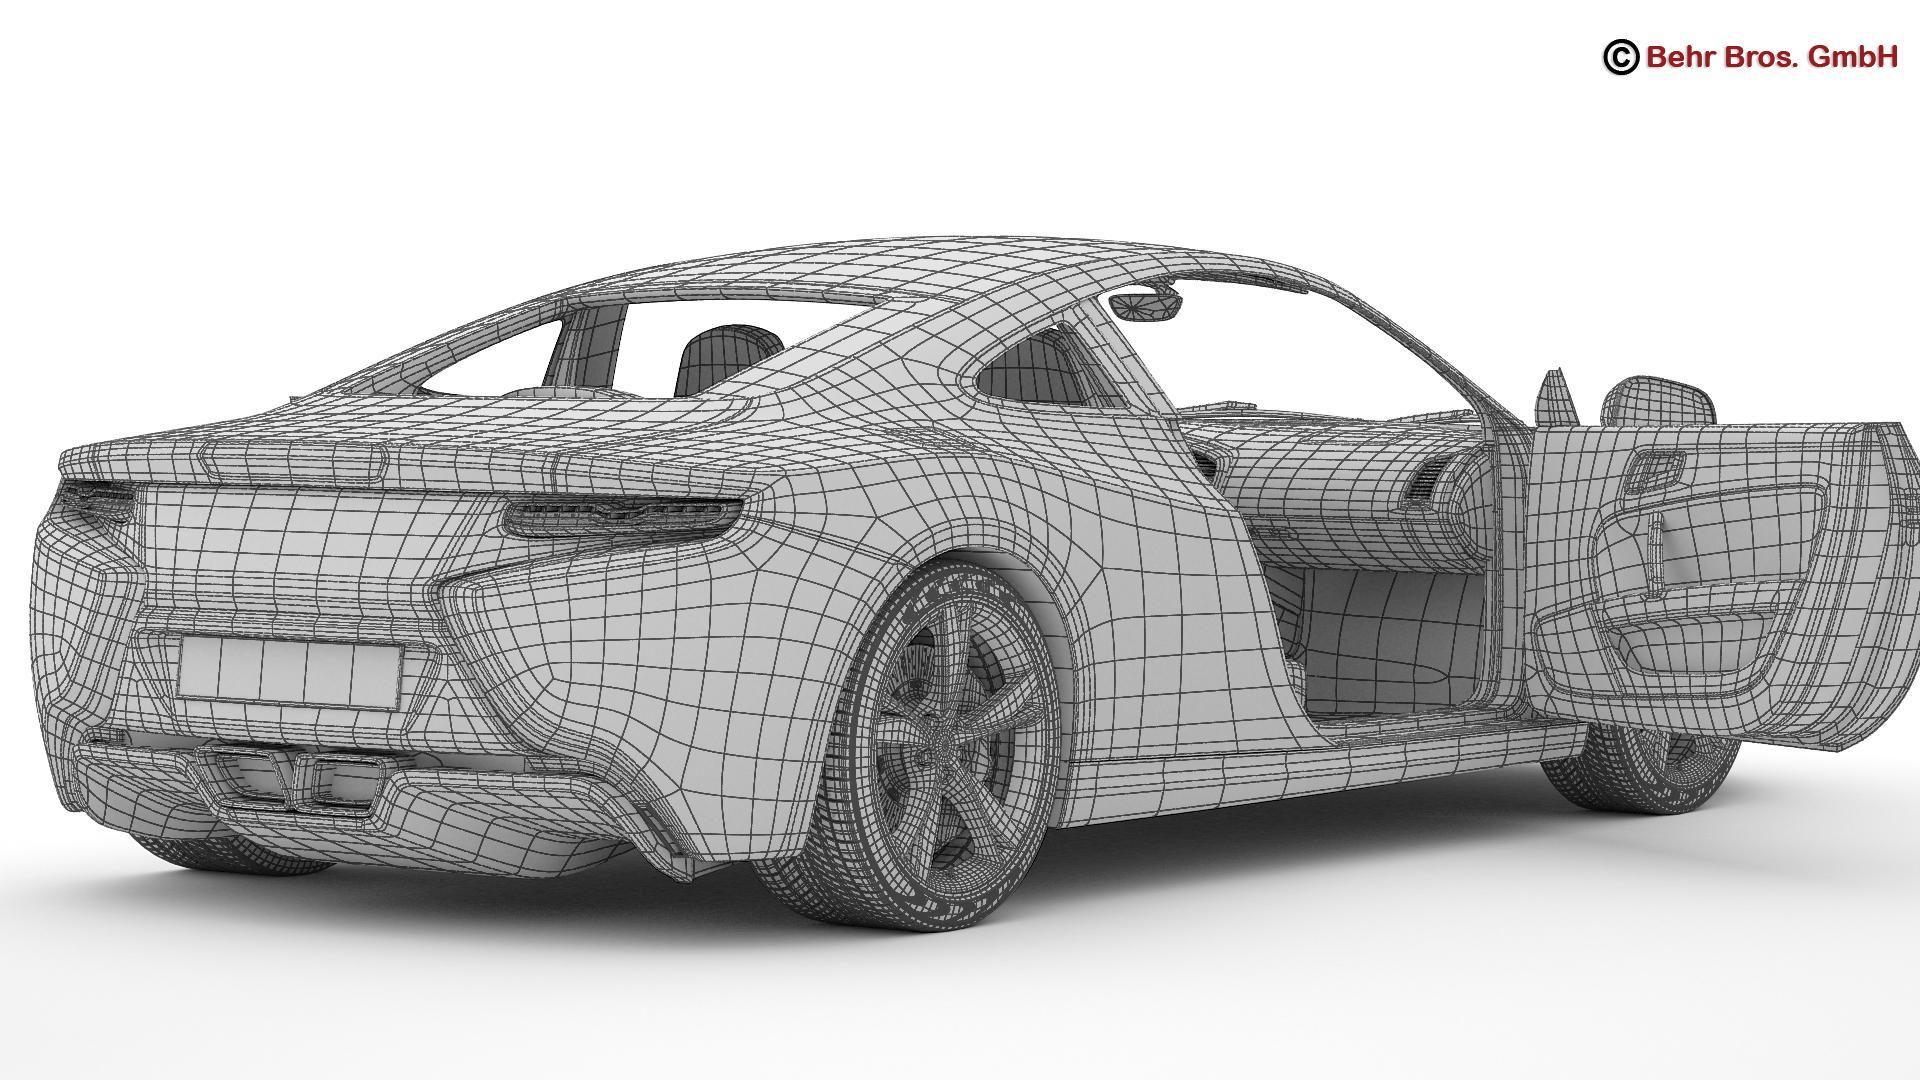 generic sports car 3d model 3ds max fbx c4d lwo ma mb obj 160538